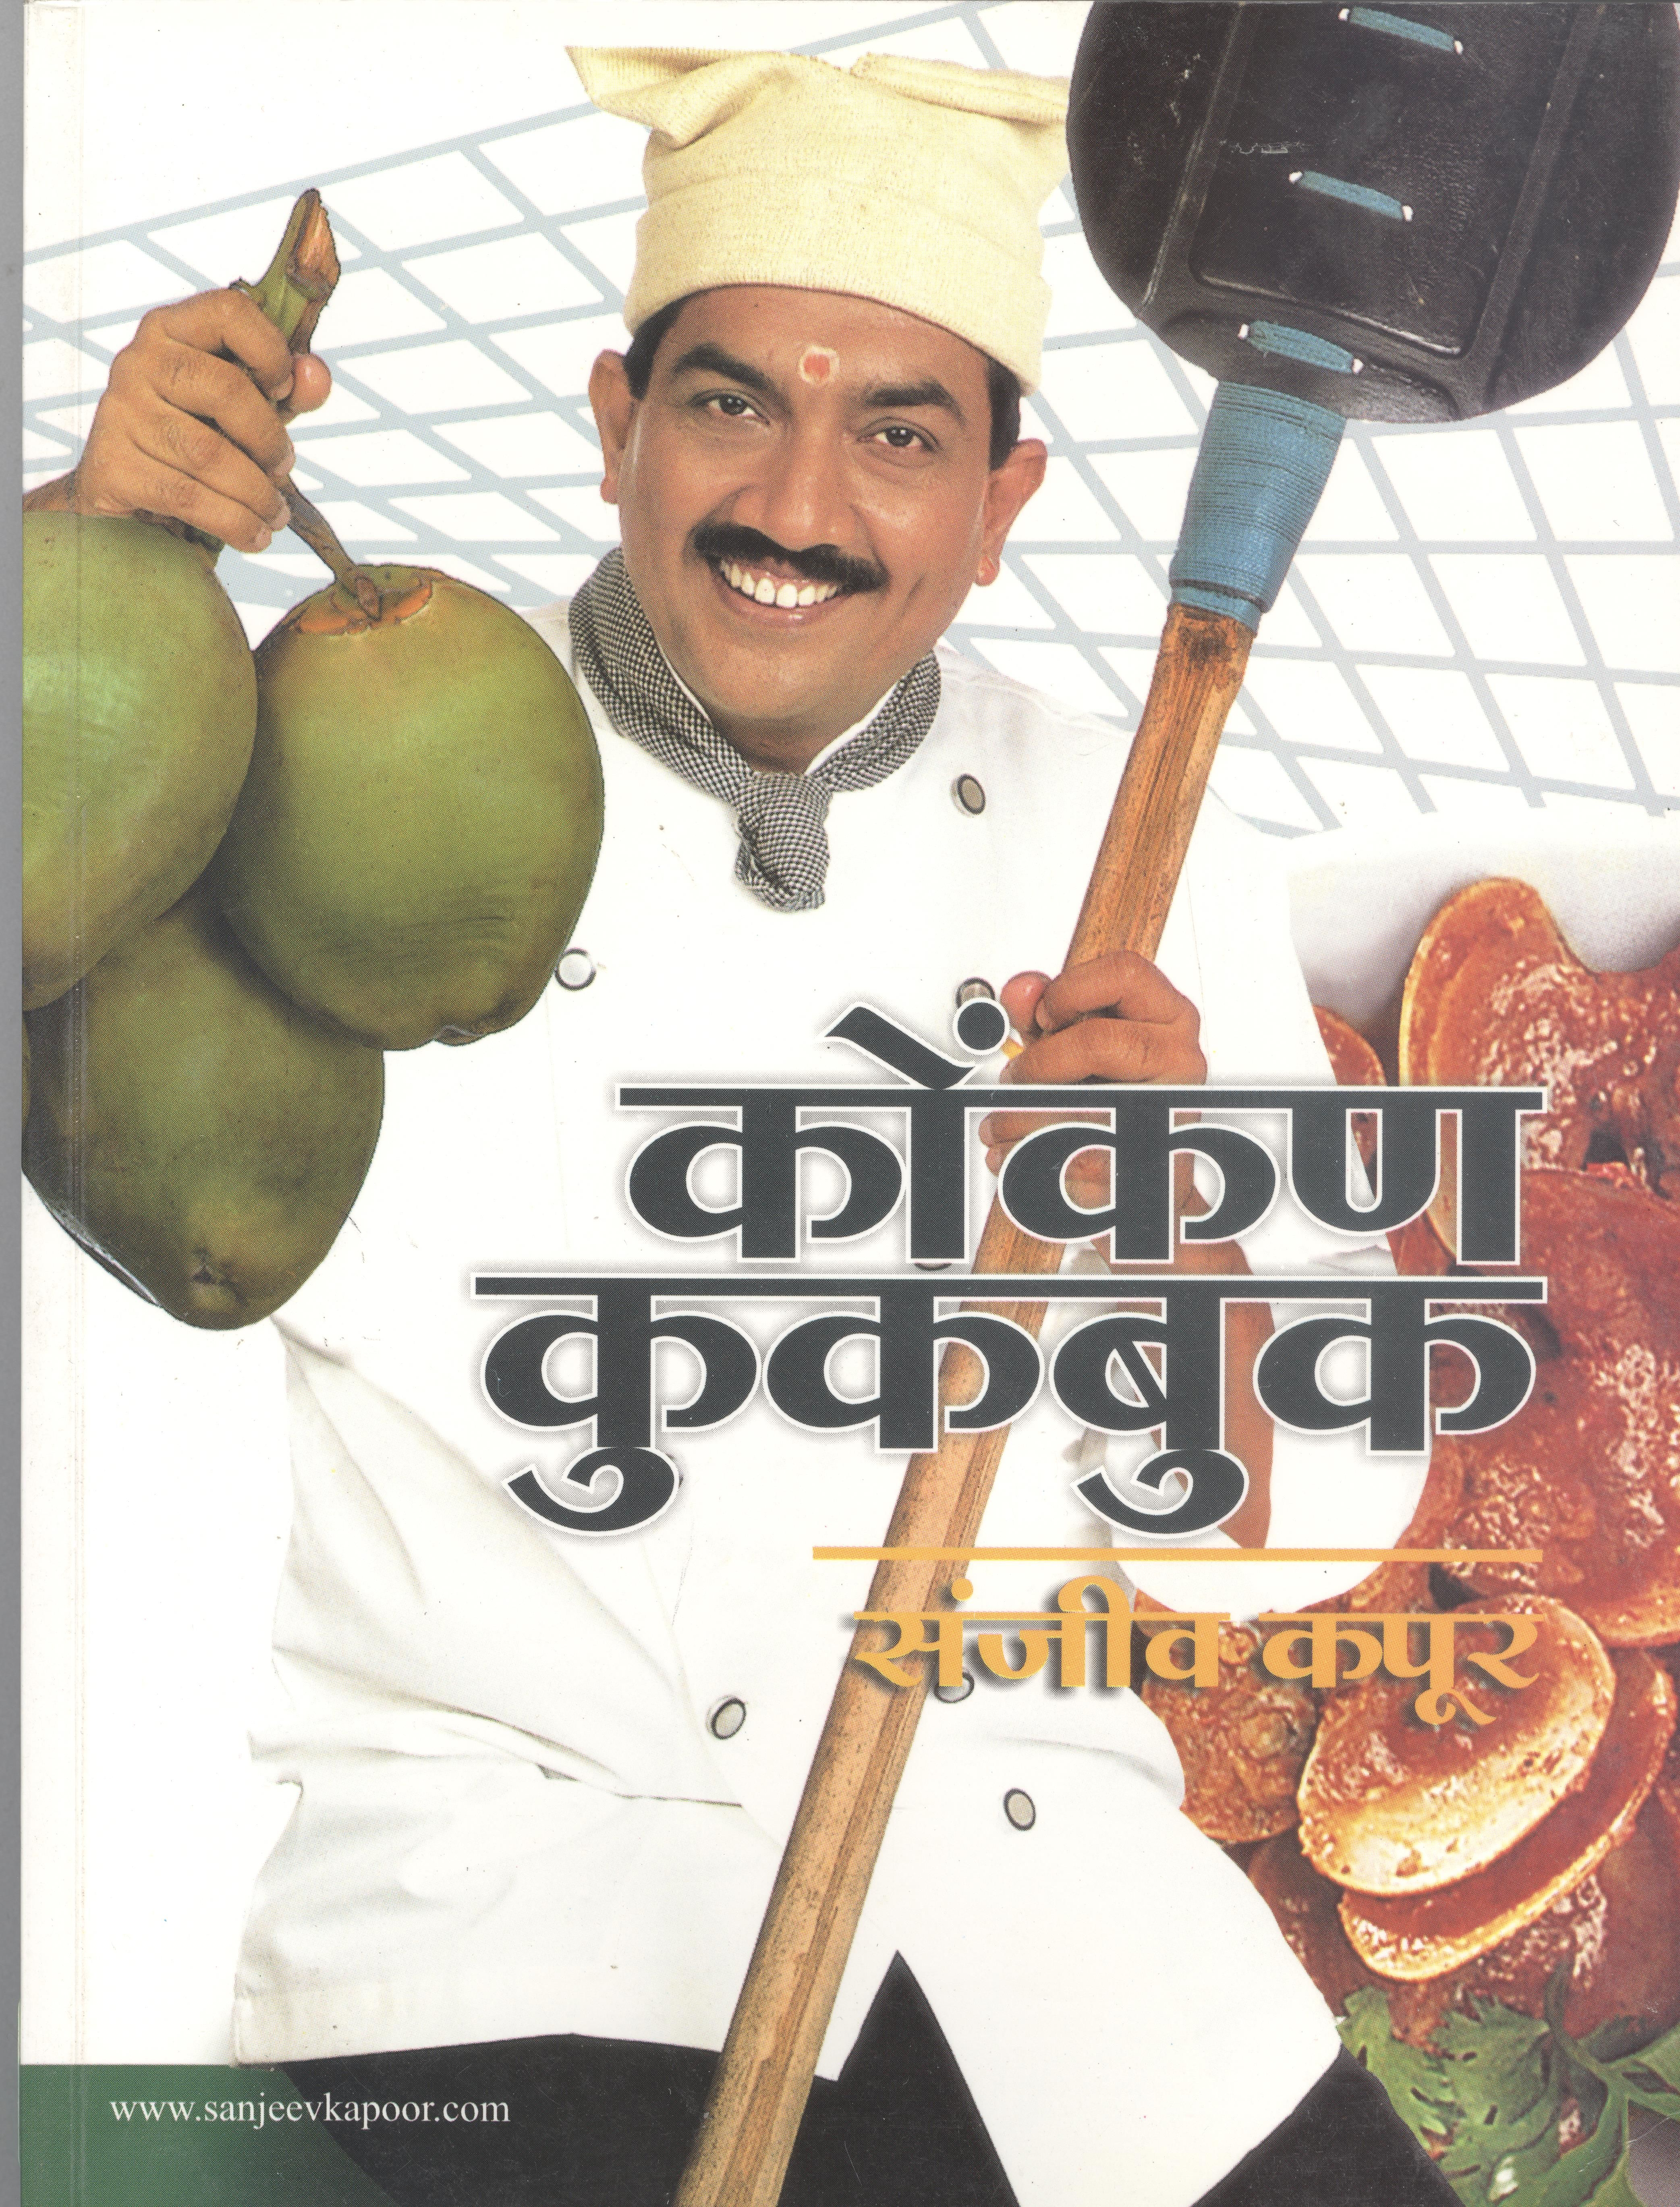 Konkan Cookbook By Sanjeev Kapoor. | Welcome to My Recipe World ...